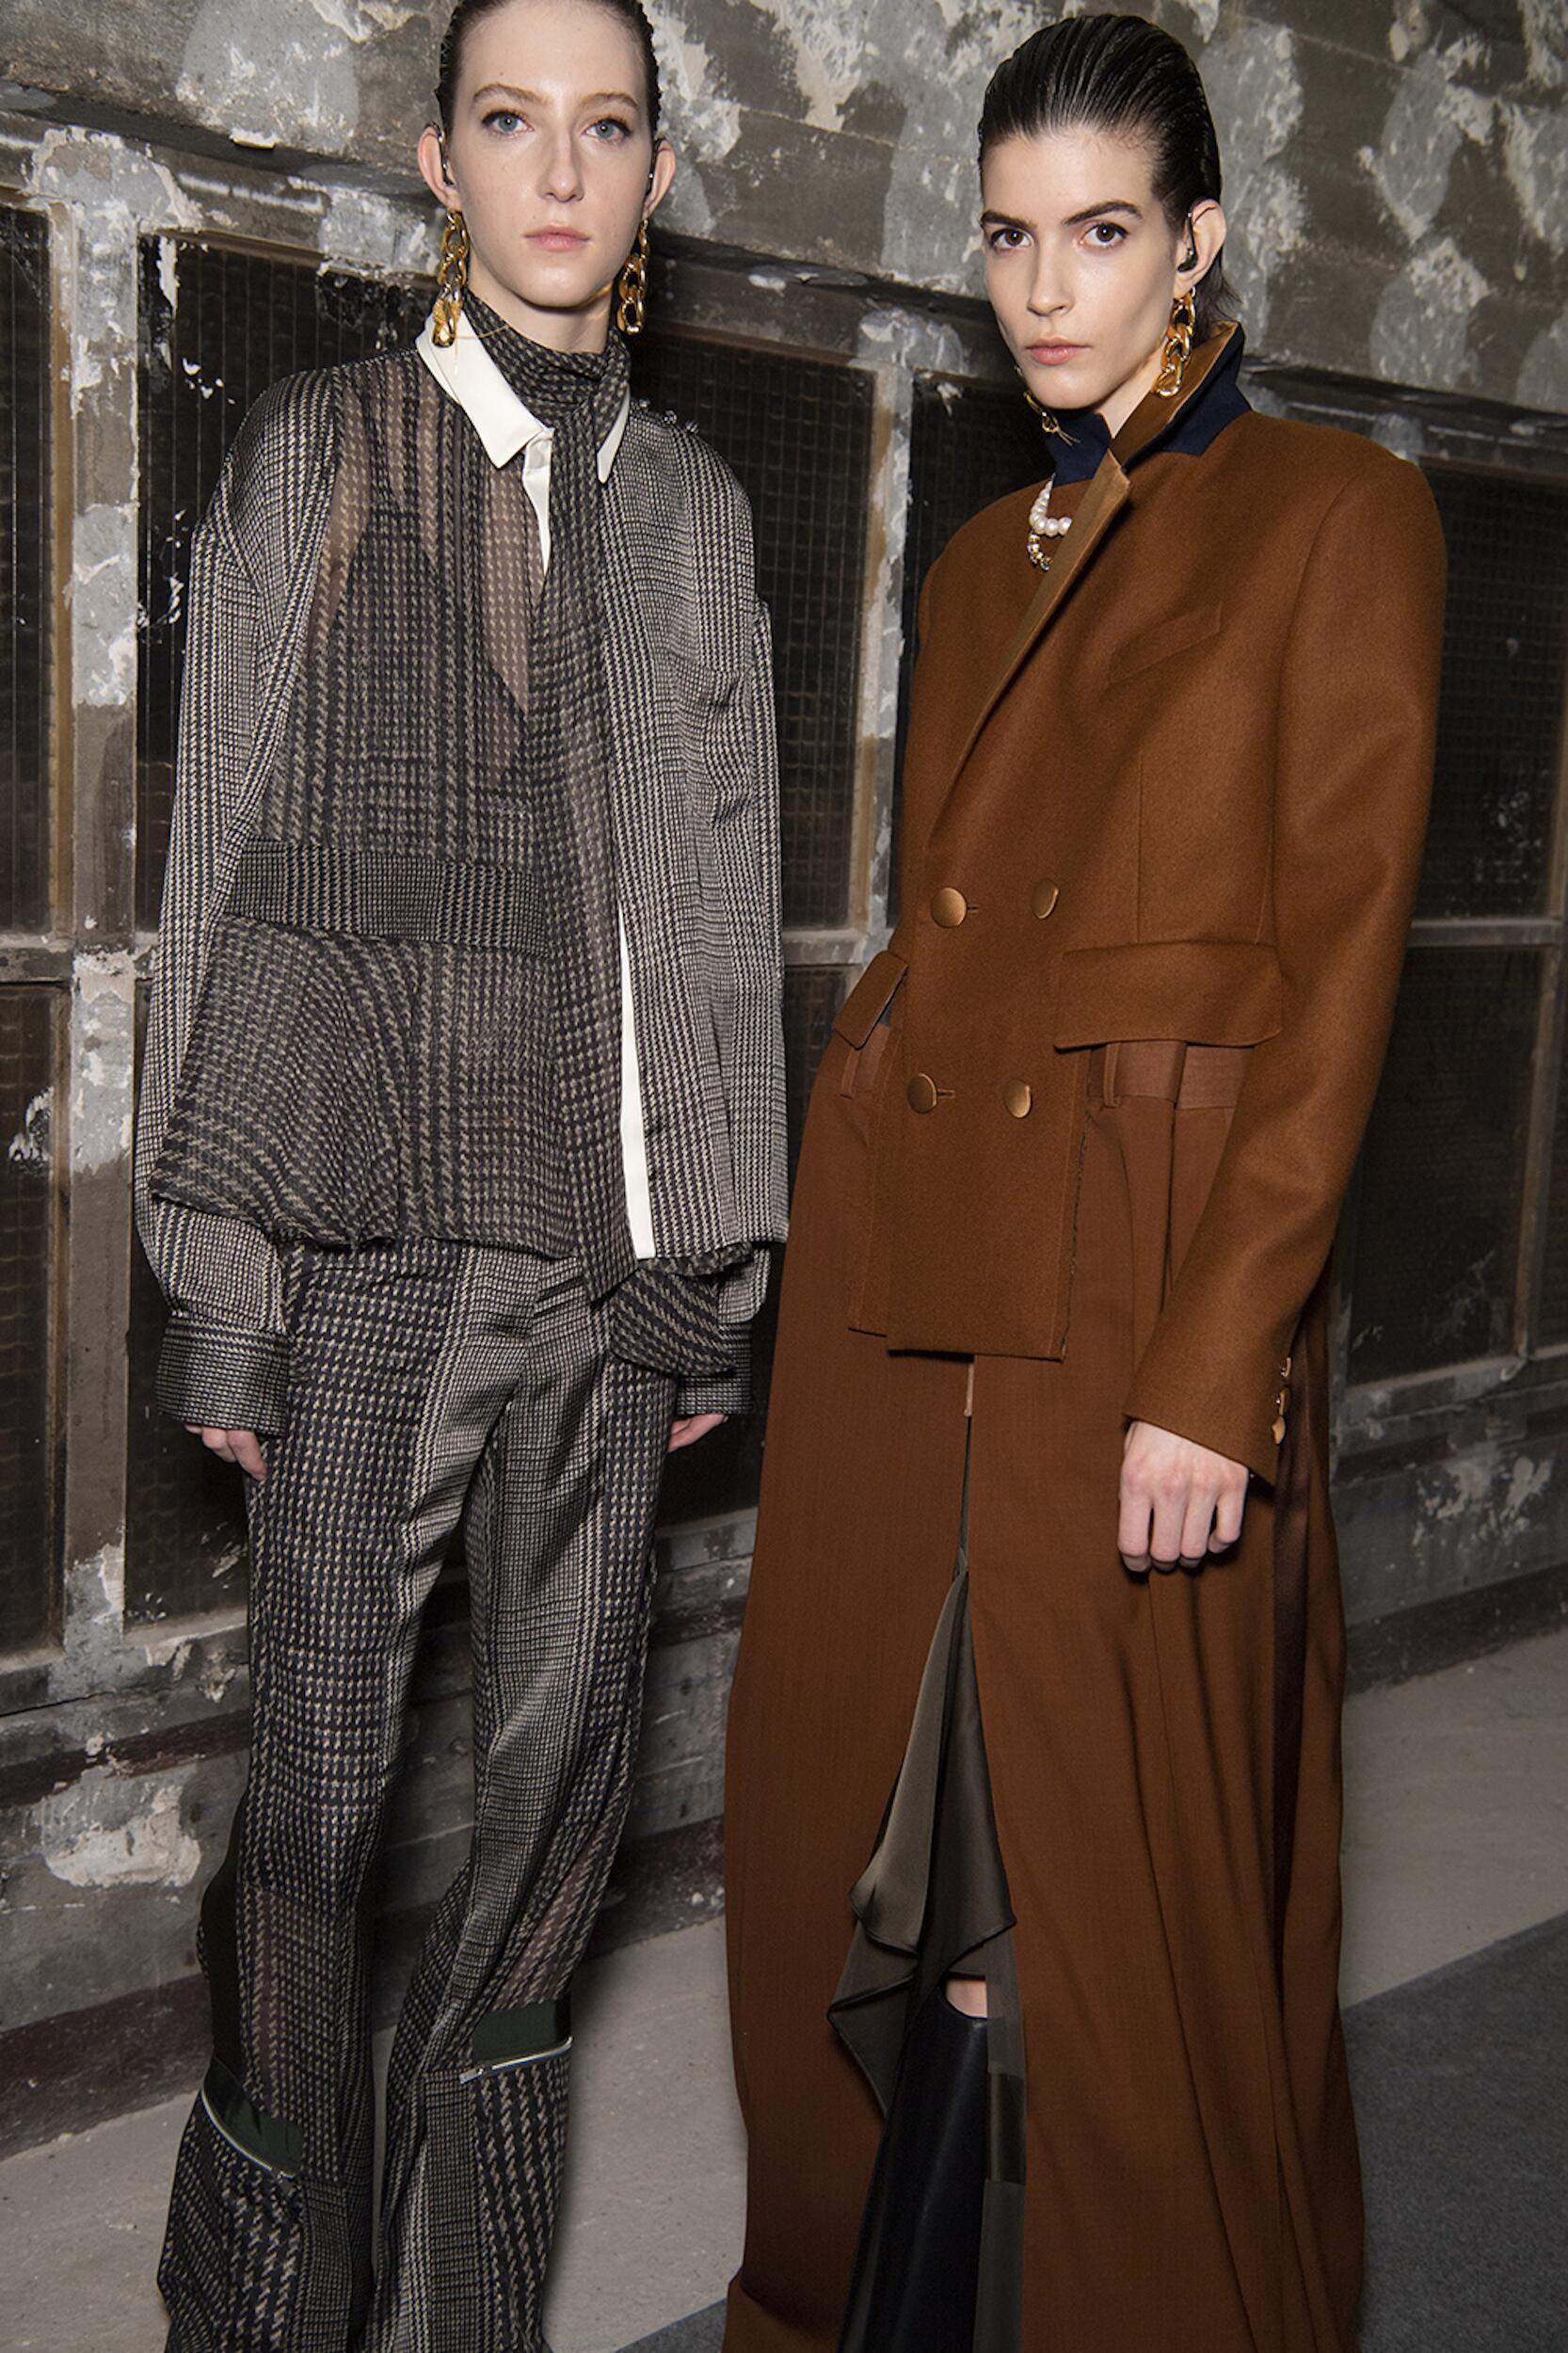 Models Fall Winter 2020 Backstage Sacai